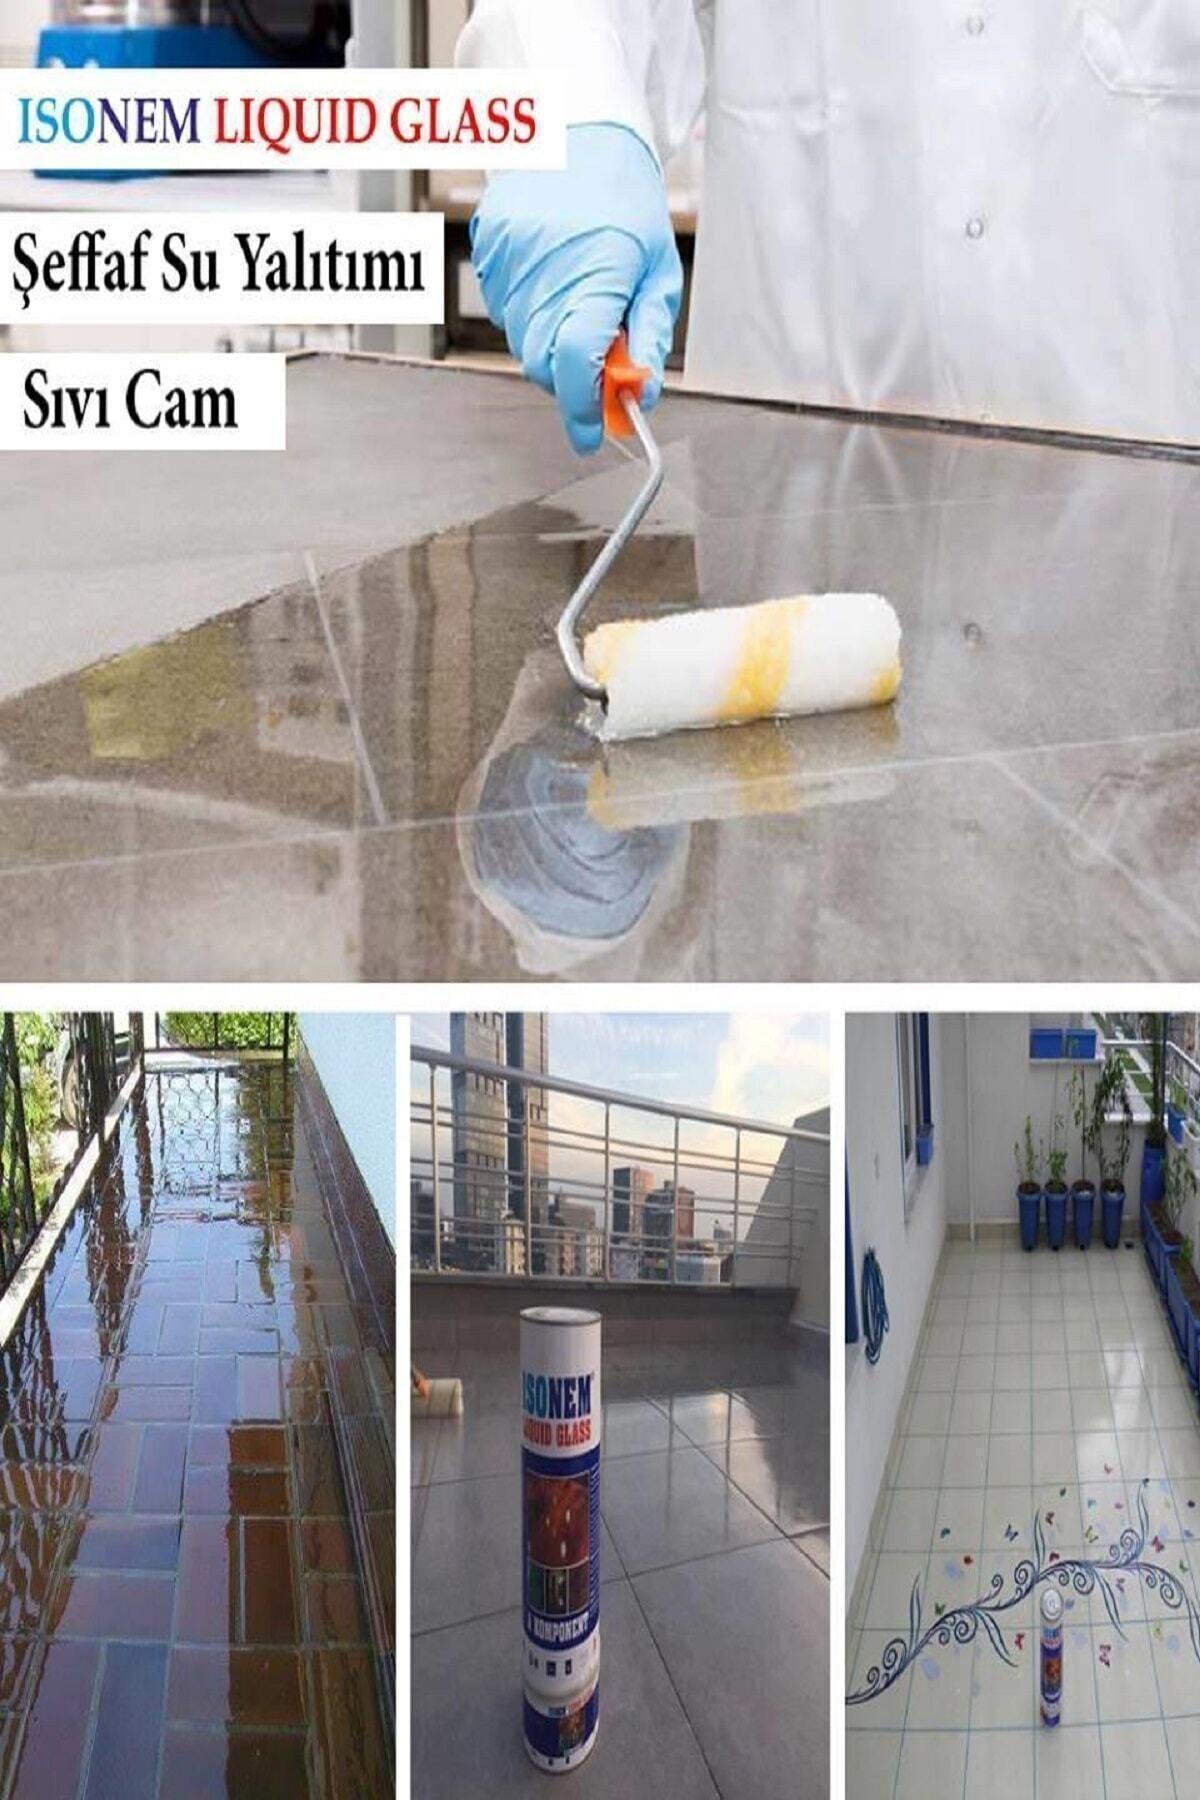 Isonem Liquid Glass (Sıvı Cam) 2 Kg Şeffaf Zemin Su Yalıtımı 2